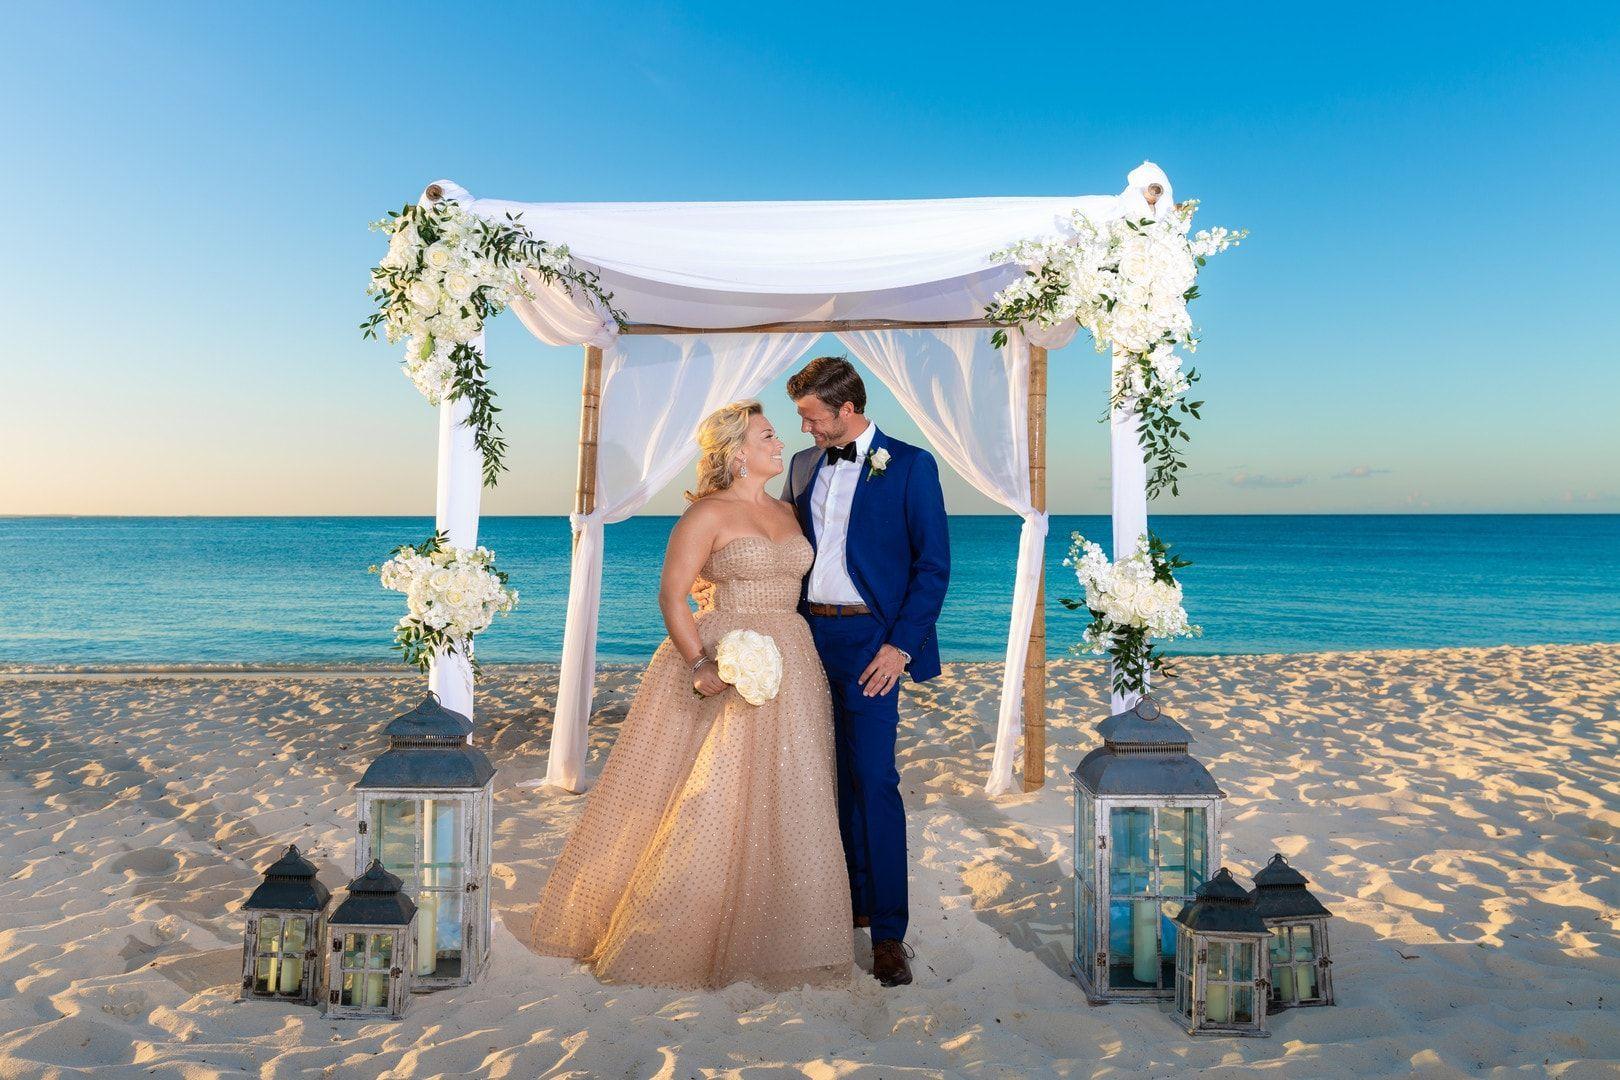 Classy Wedding For A Non Traditional Bride In The Turks Caicos Islands Adriana Weddings In 2020 Outdoor Wedding Altars Classy Wedding Turks And Caicos Wedding